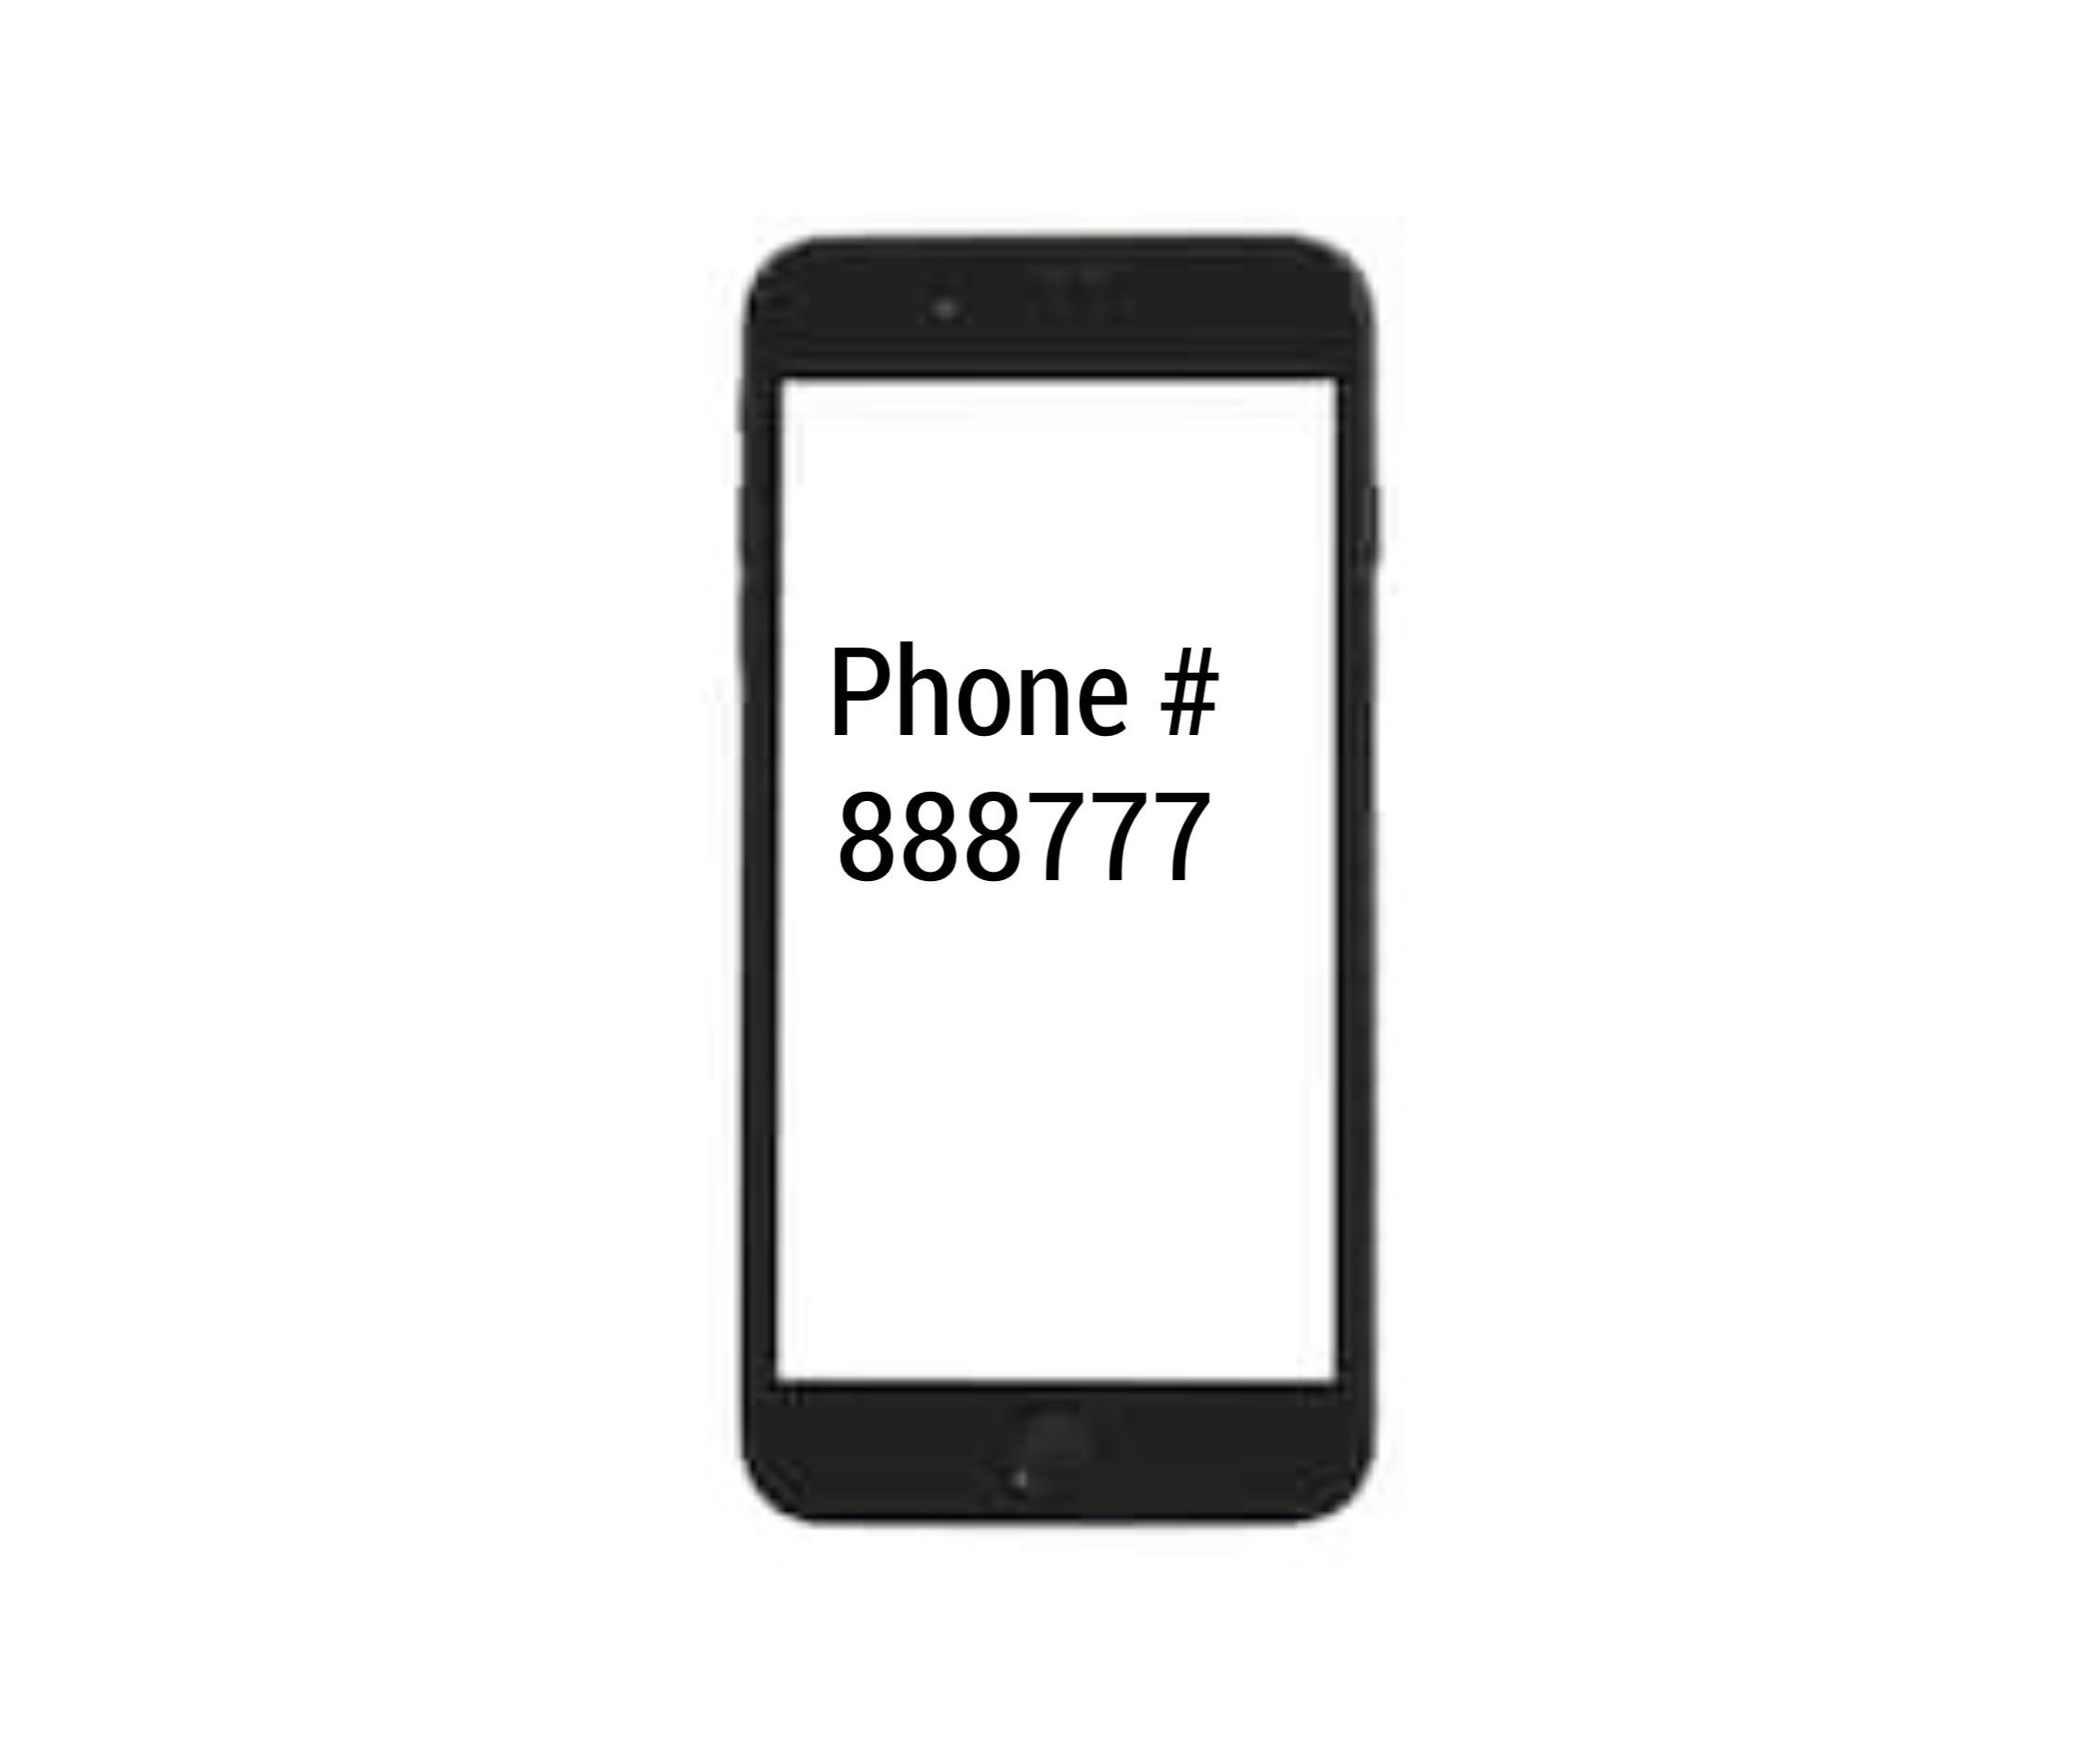 888777